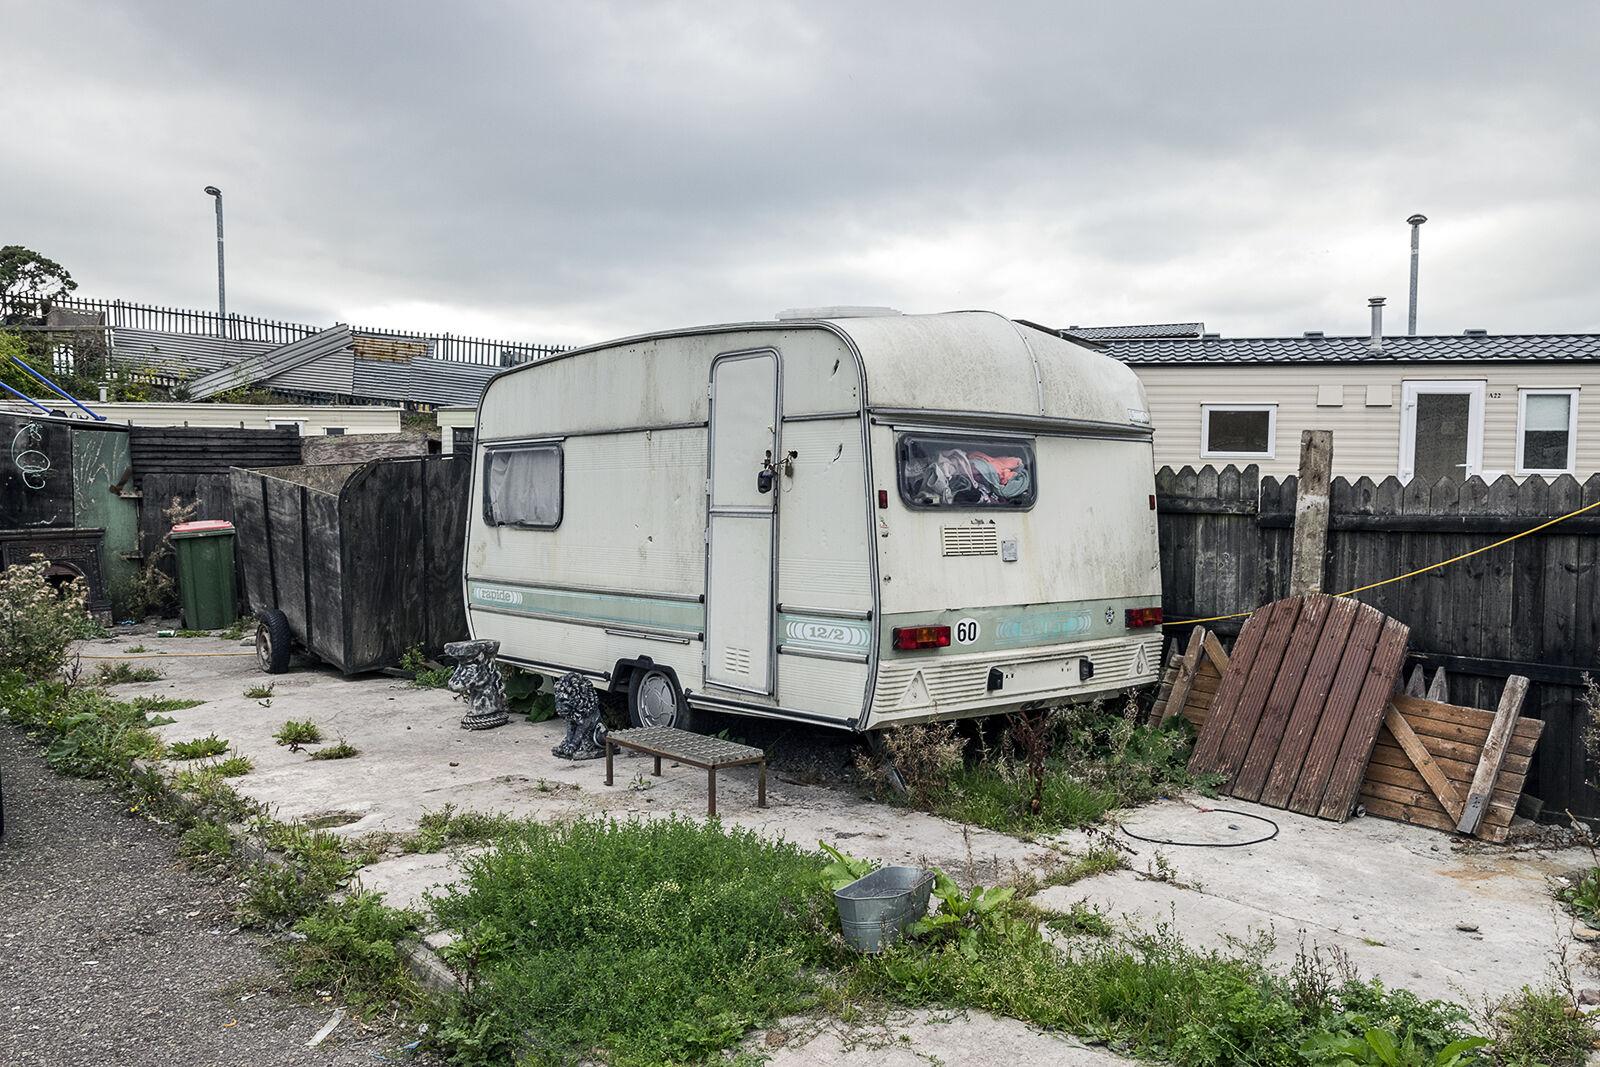 Vintage Caravan, halting site, Cork, Ireland 2018